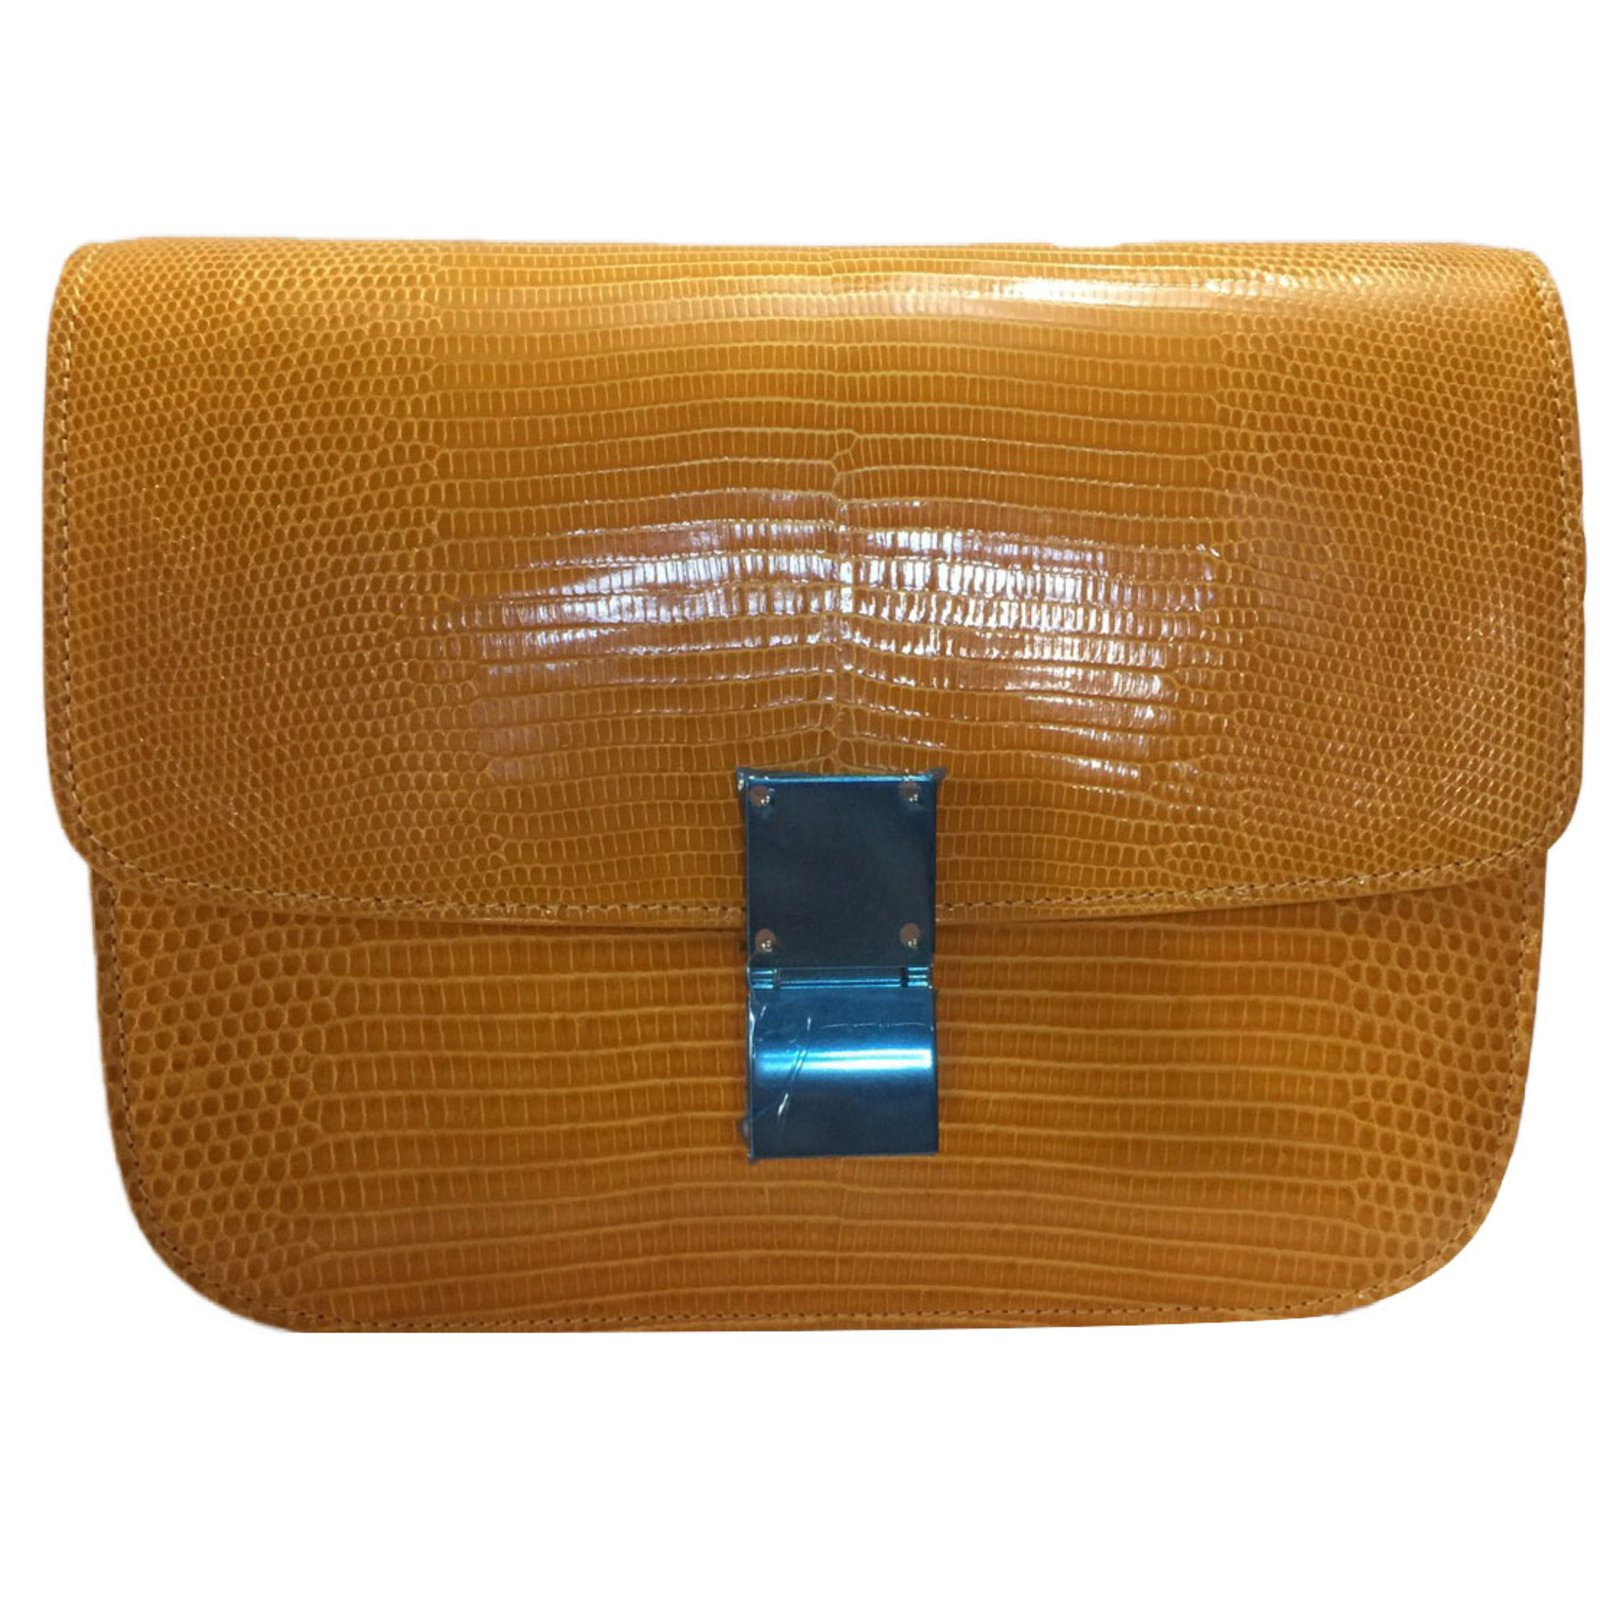 C 233 Line Celine Box Lizard Yellow Handbags Exotic Leather Yellow Ref 42766 Joli Closet